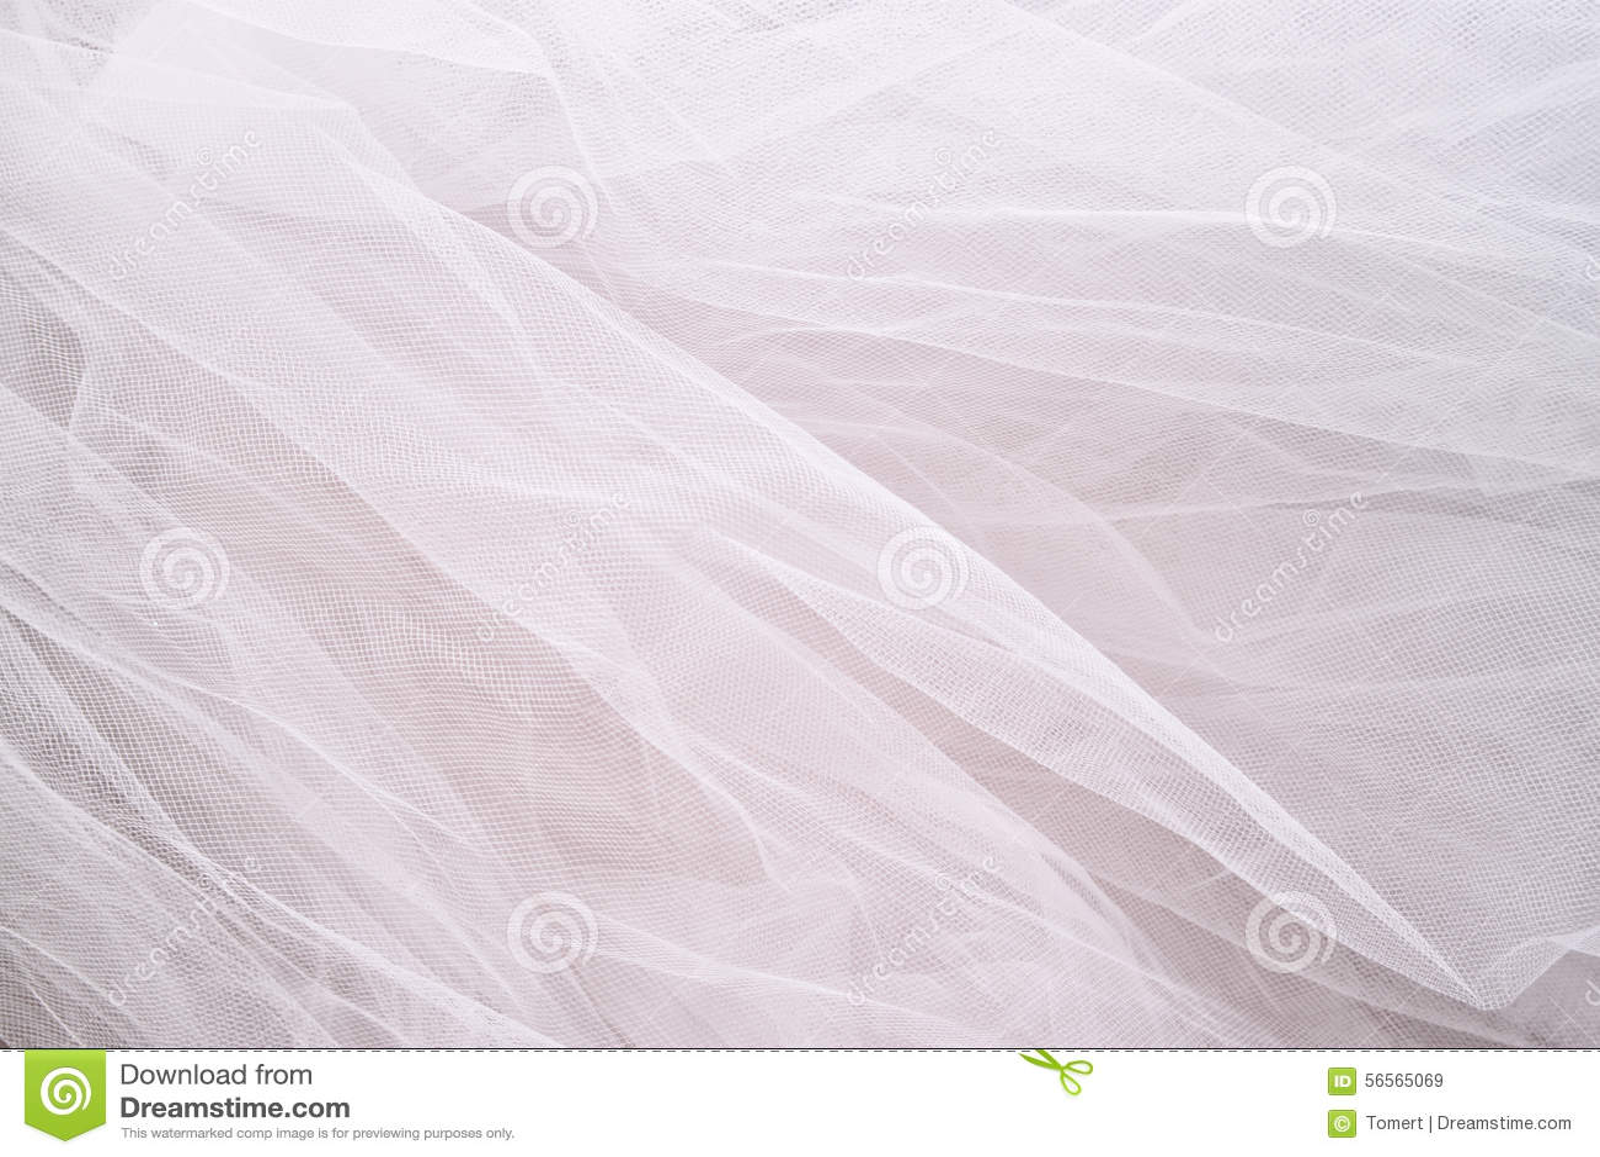 Download Εκλεκτής ποιότητας υπόβαθρο σύστασης σιφόν του Tulle γάμος σκαλοπατιών πορτρέτου φορεμάτων έννοιας νυφών Στοκ Εικόνα - εικόνα από μόδα, ημέρα: 56565069